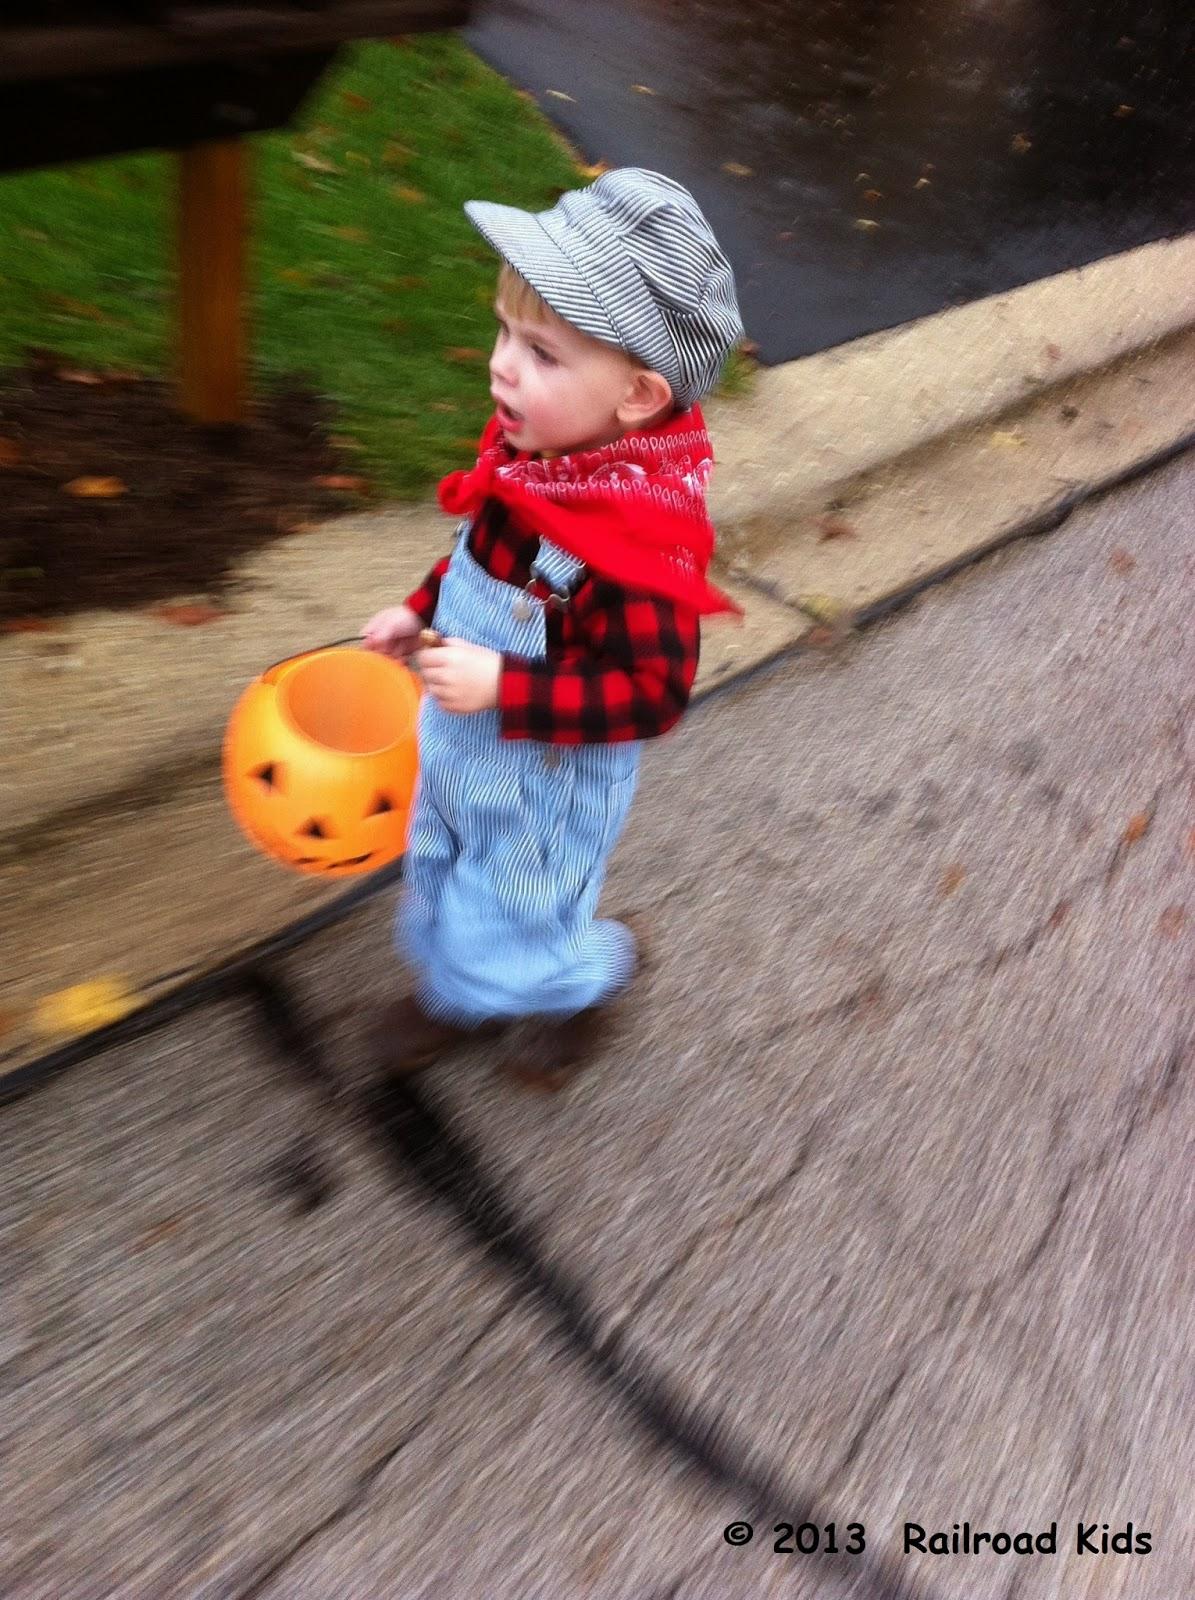 & Railroad Kids: Halloween Costume: Train Engineer Redux